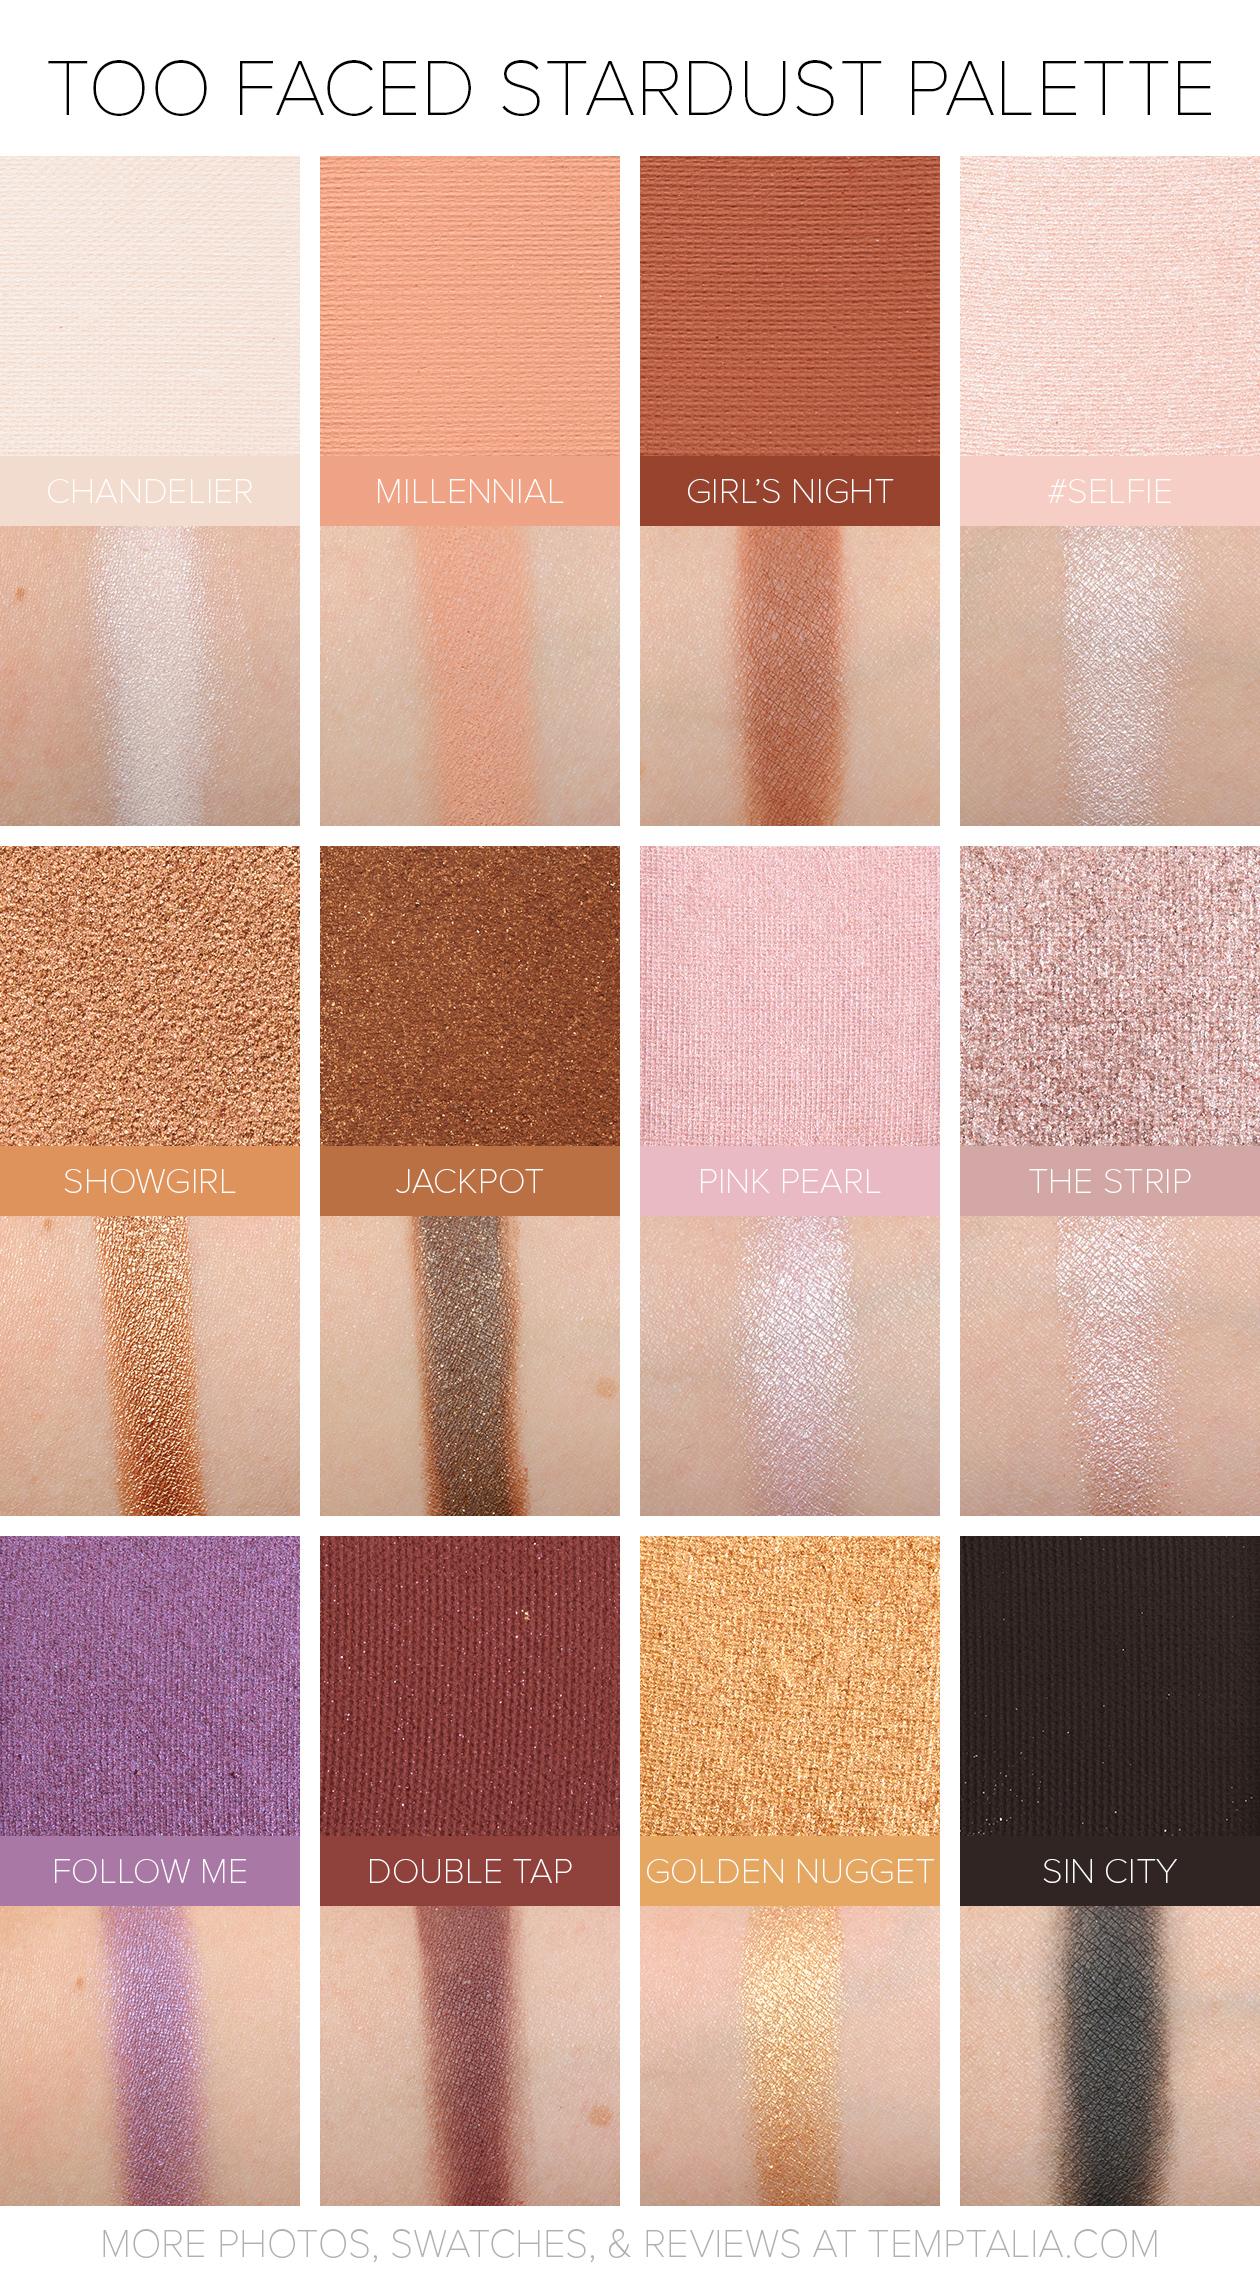 sneak peek too faced stardust eyeshadow palette photos. Black Bedroom Furniture Sets. Home Design Ideas